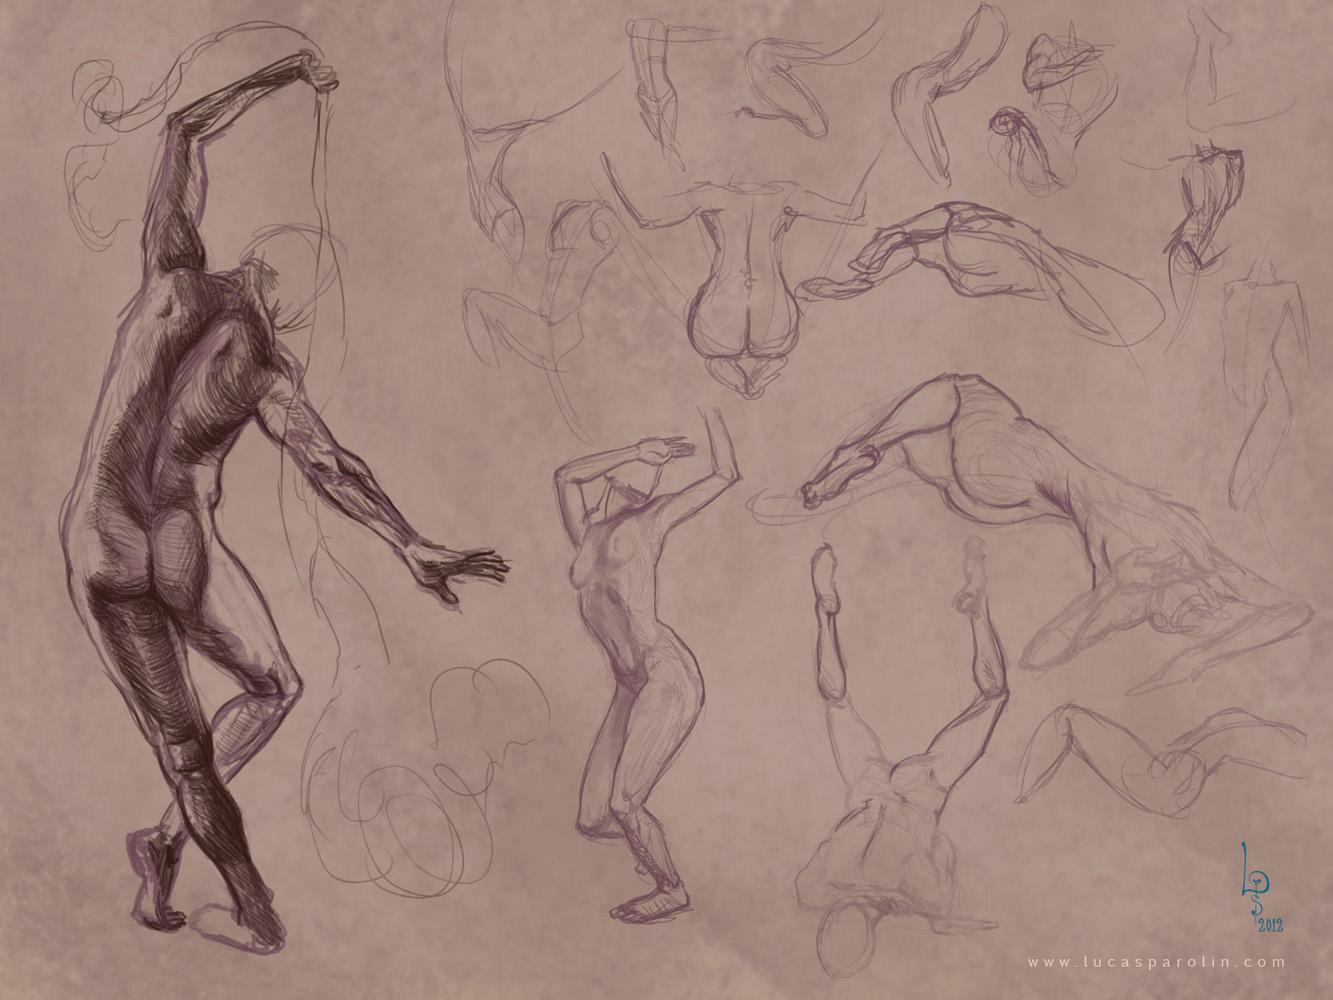 Lucas Parolin - concept art and studies: anatomy poses